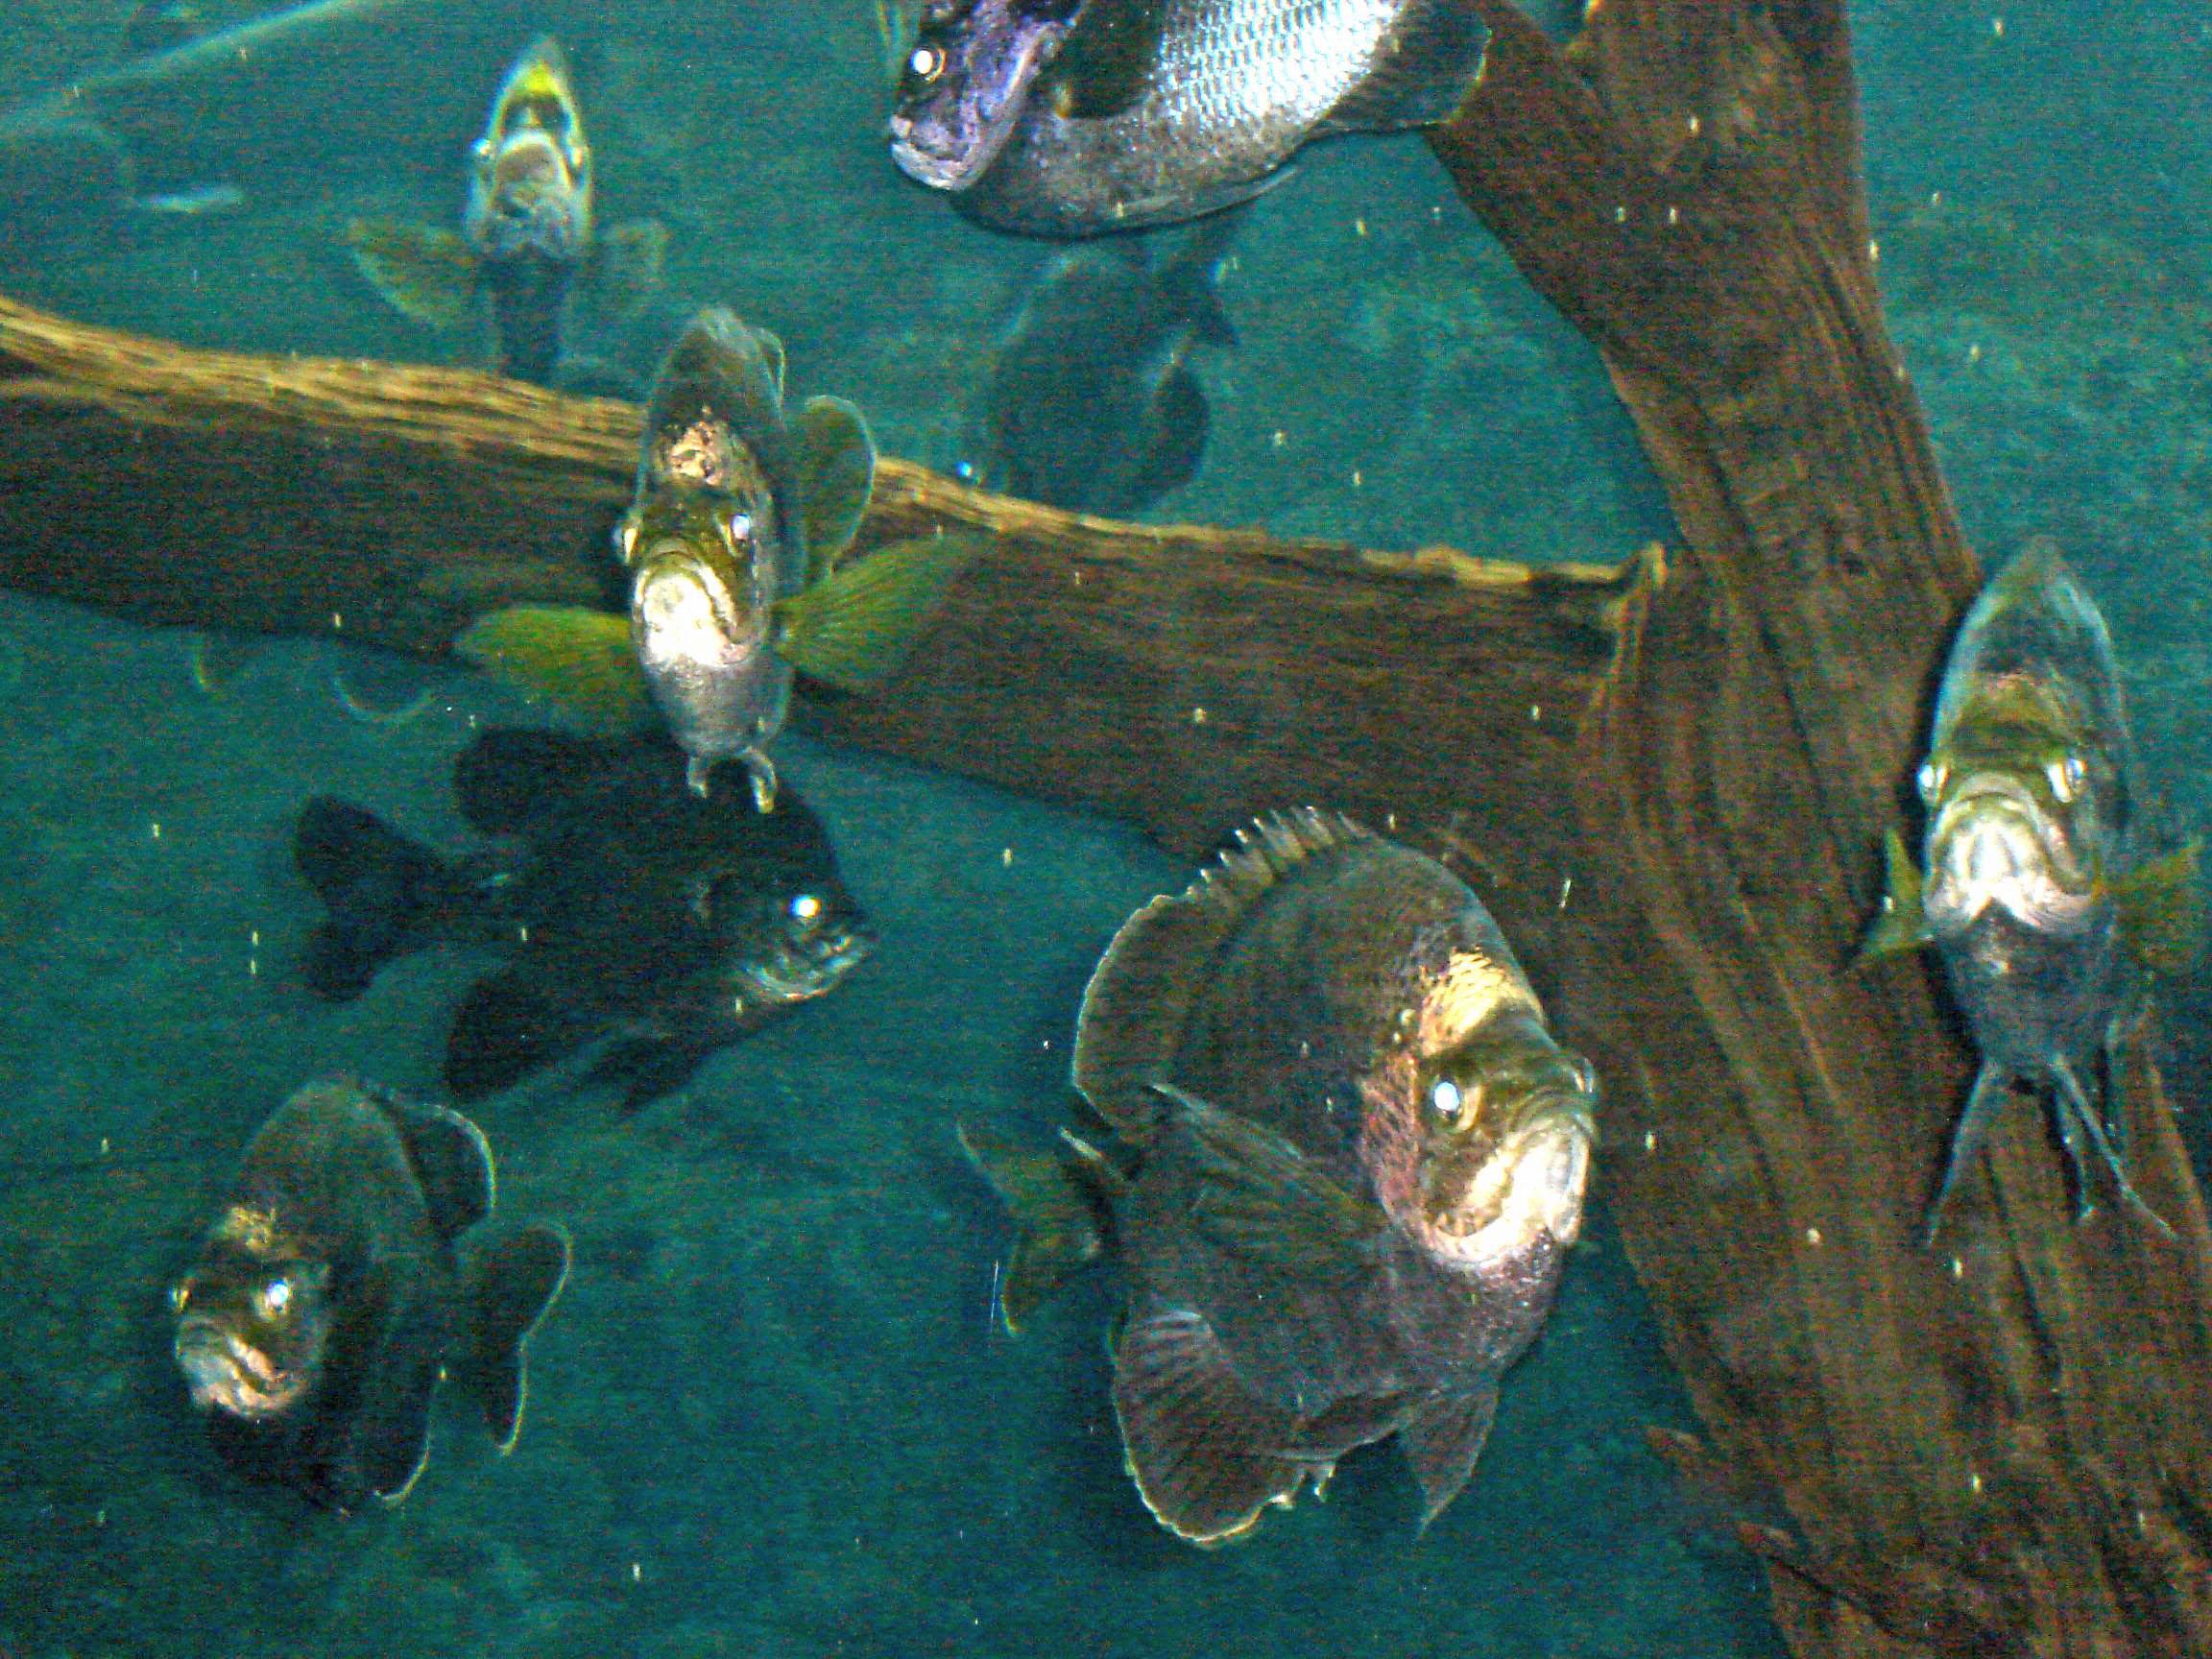 Tampa Bay Aquarium